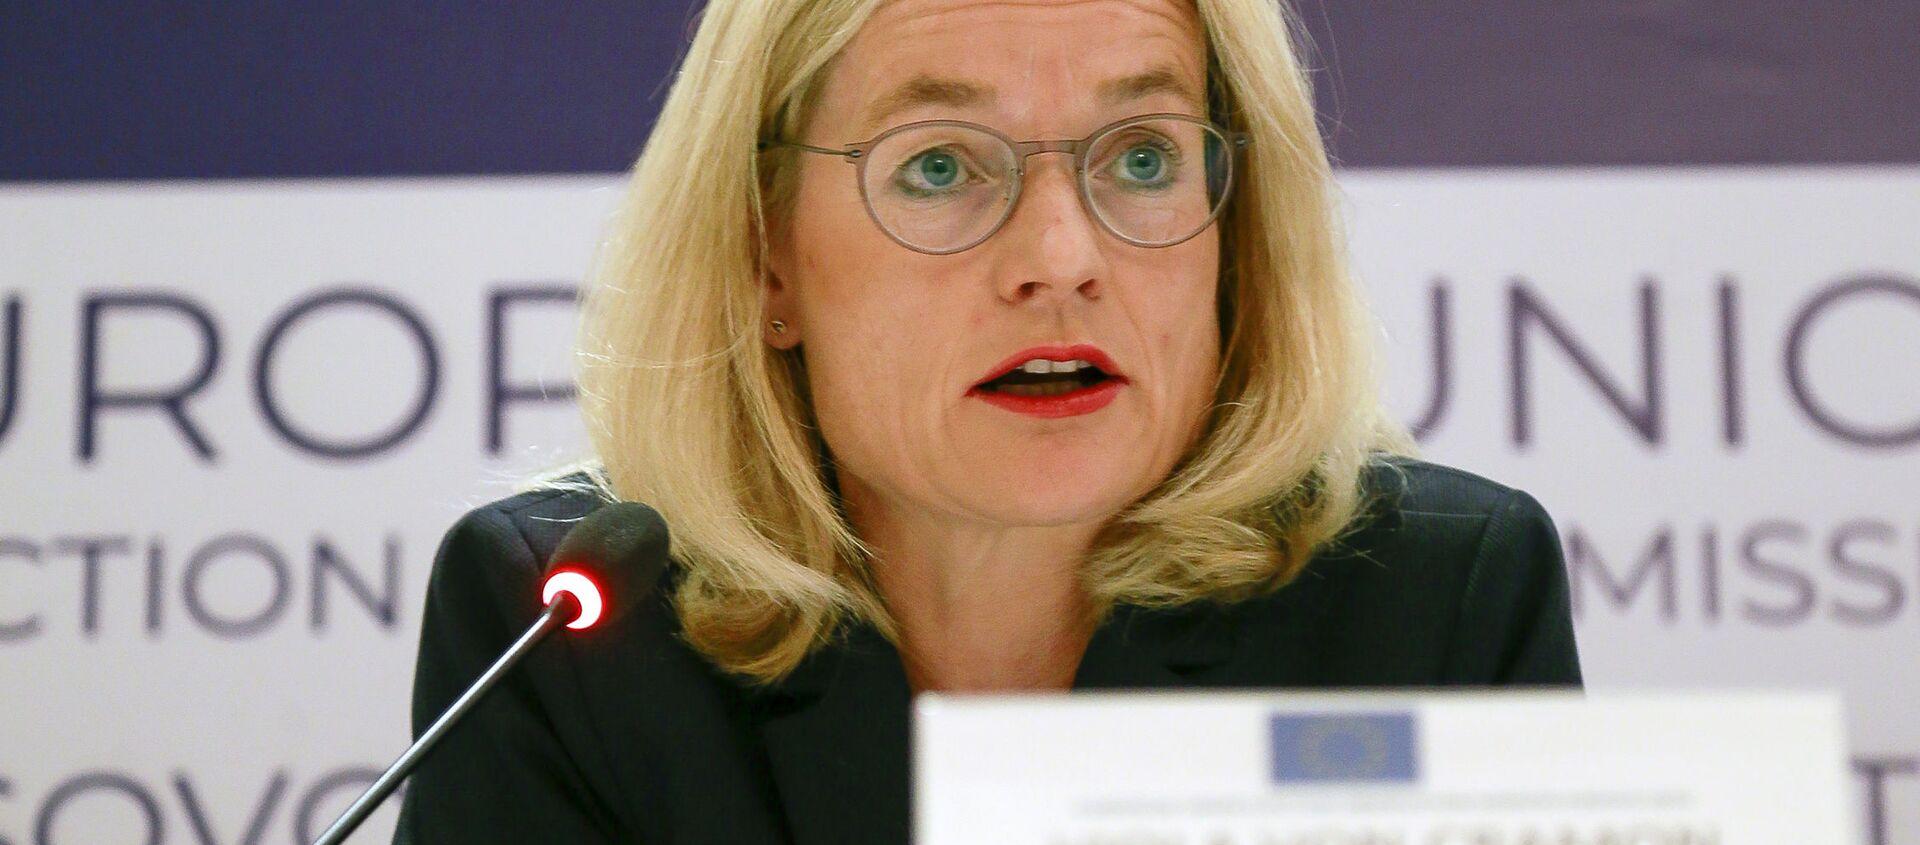 Депутат Европарламента Виола фон Крамон-Таубадель - Sputnik Грузия, 1920, 29.07.2021